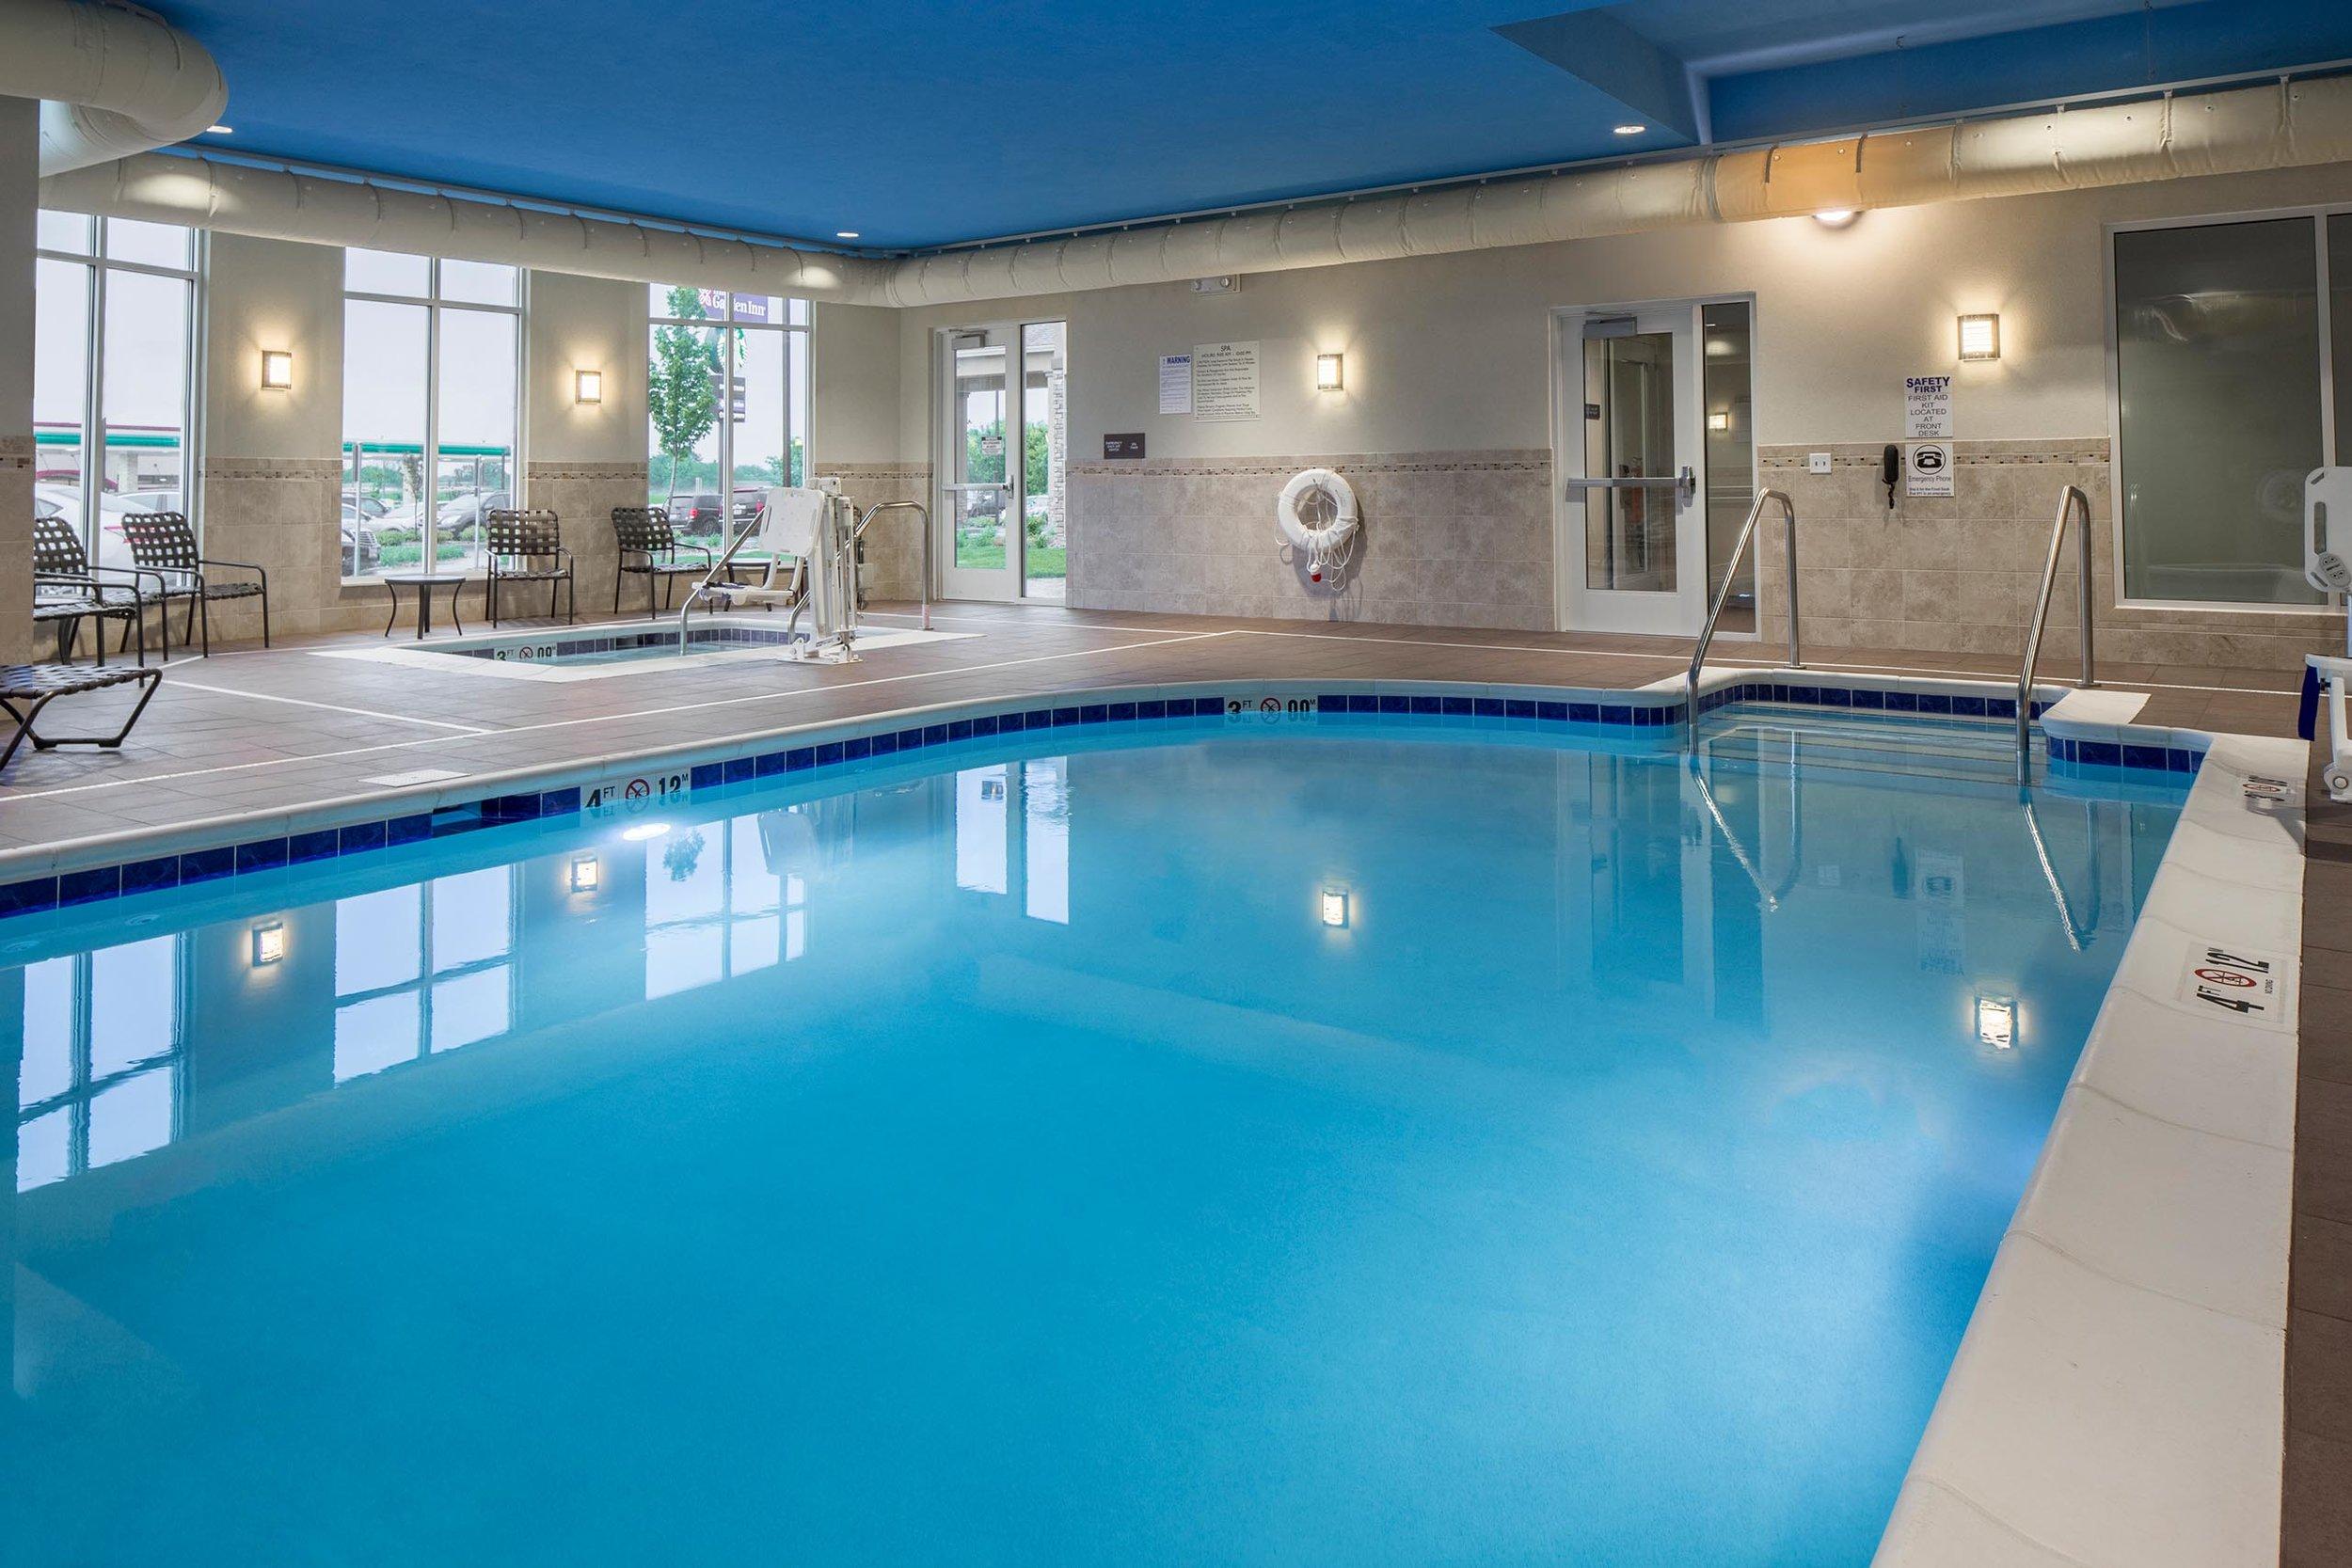 Pool at the Hilton Garden Inn in Bettendorf, IA